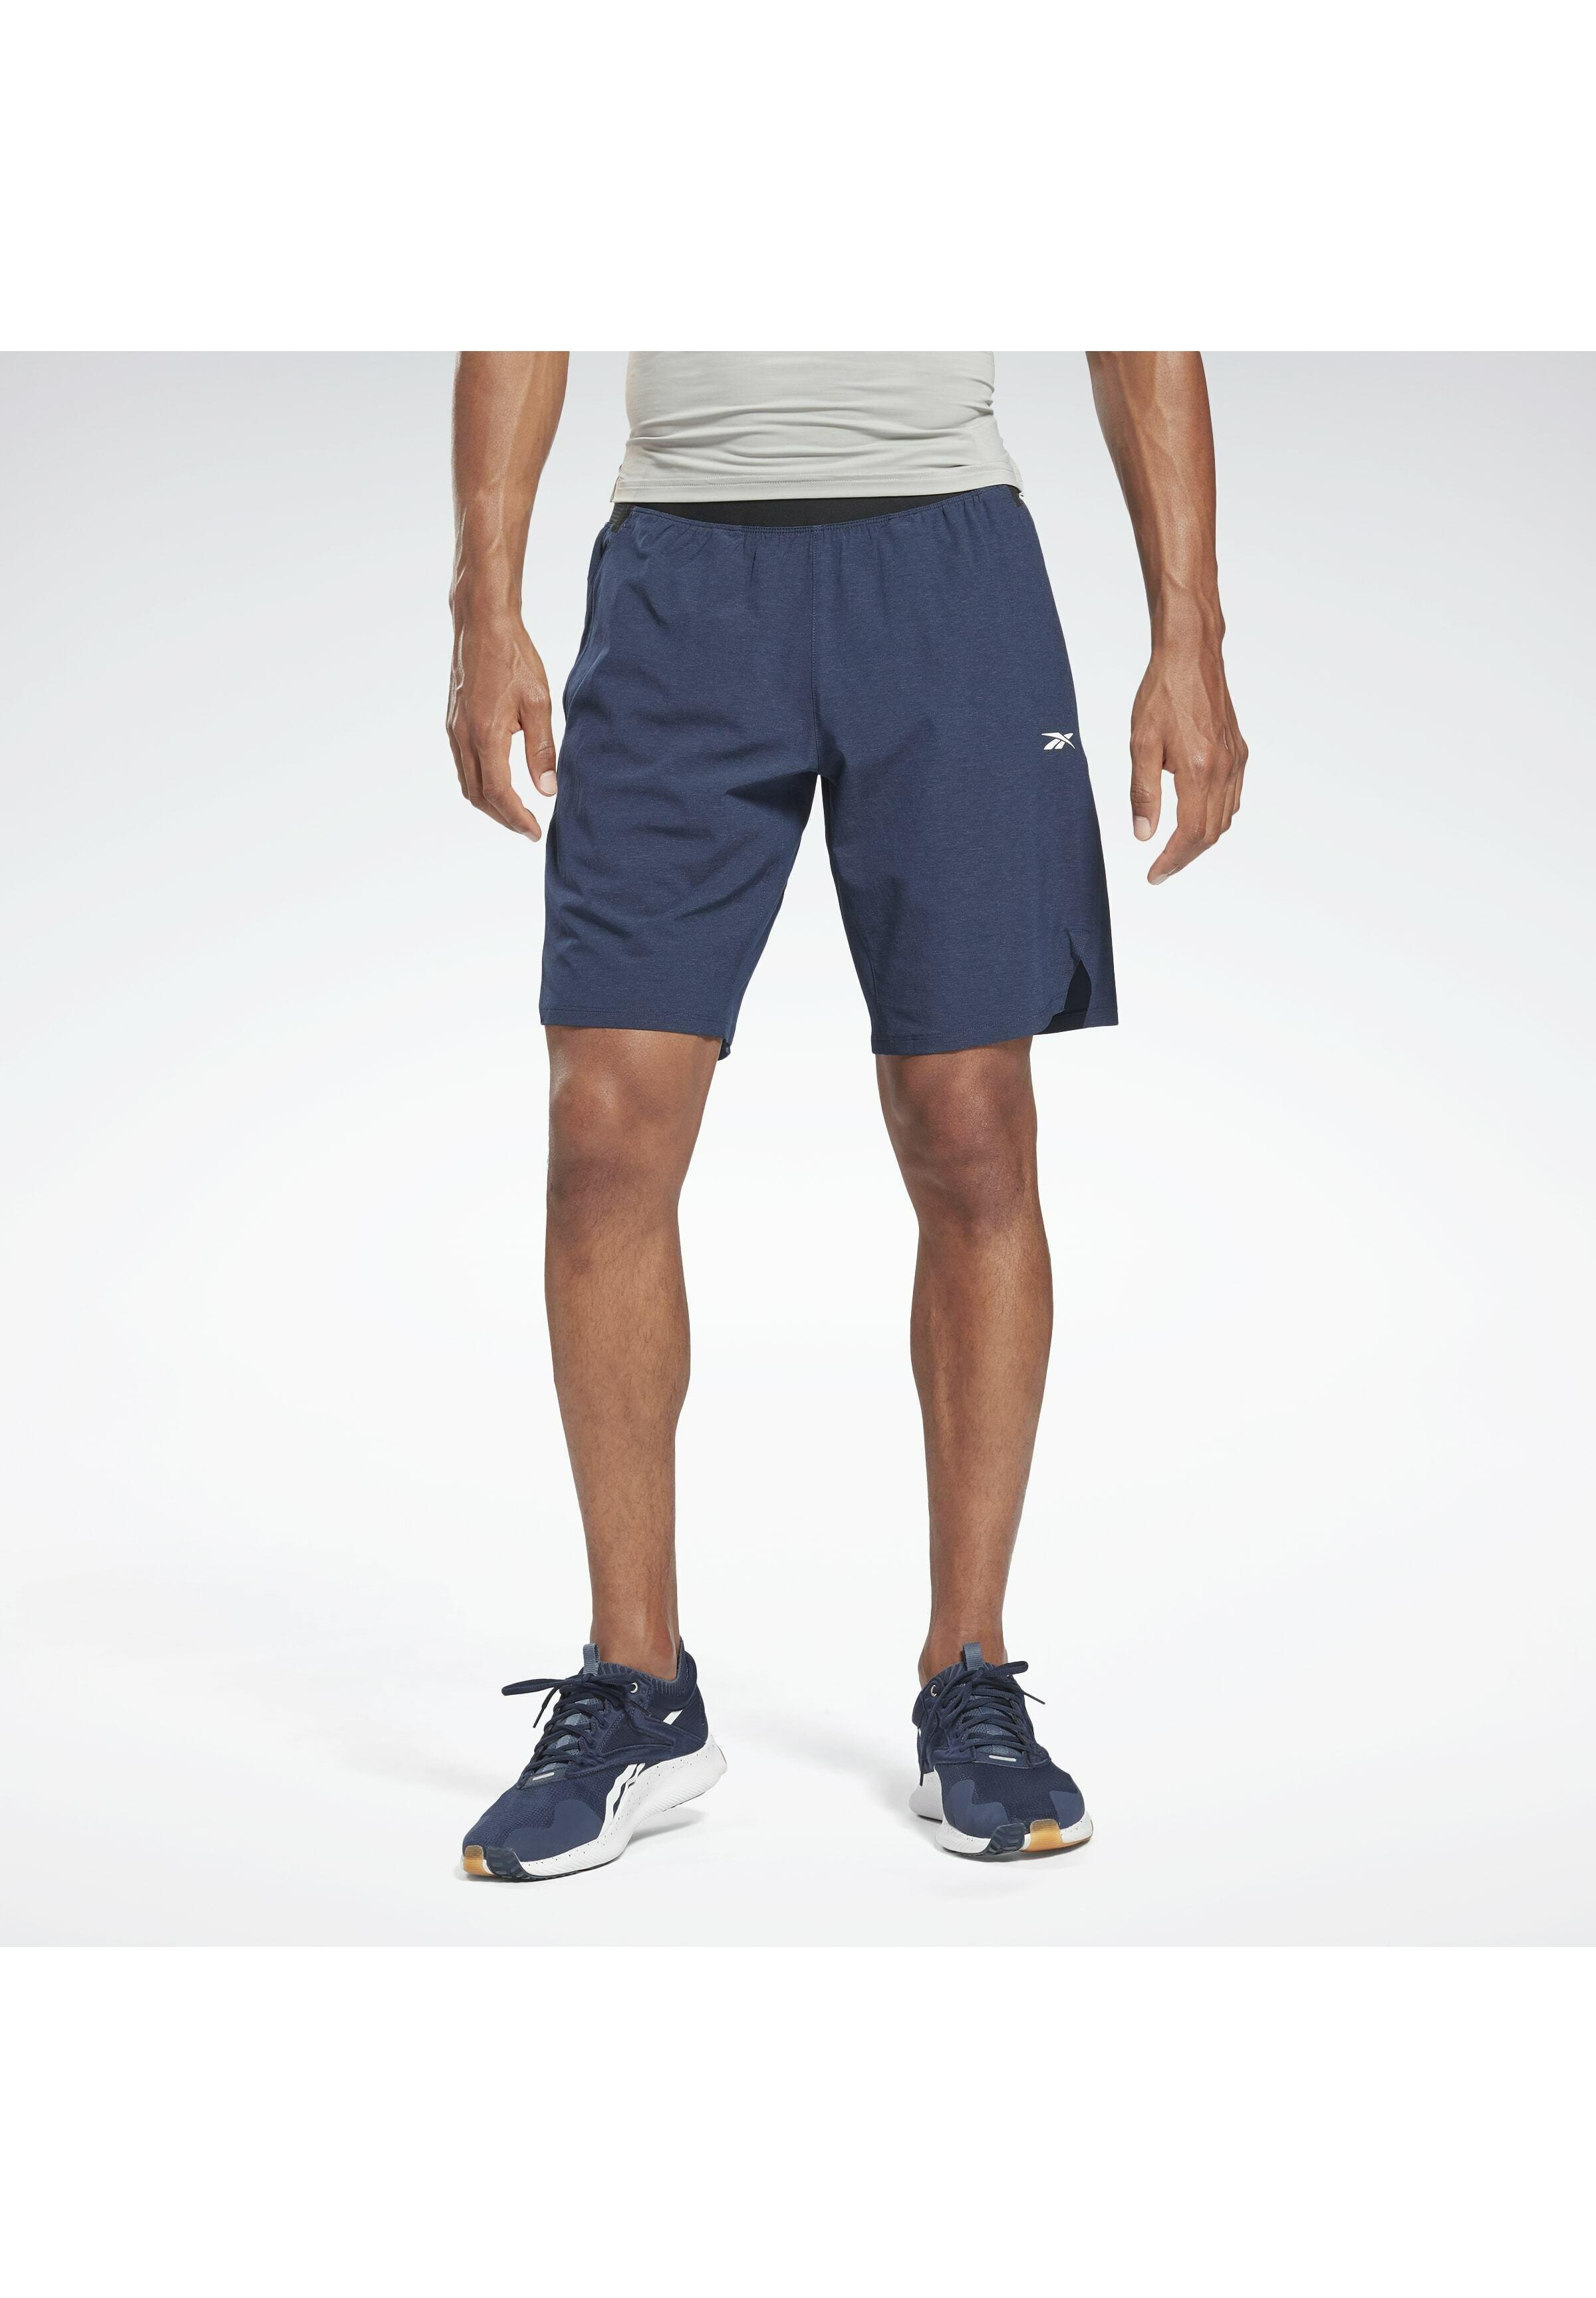 Uomo EPIC ONE SERIES SPEEDWICK REECYCLED SHORTS - Shorts